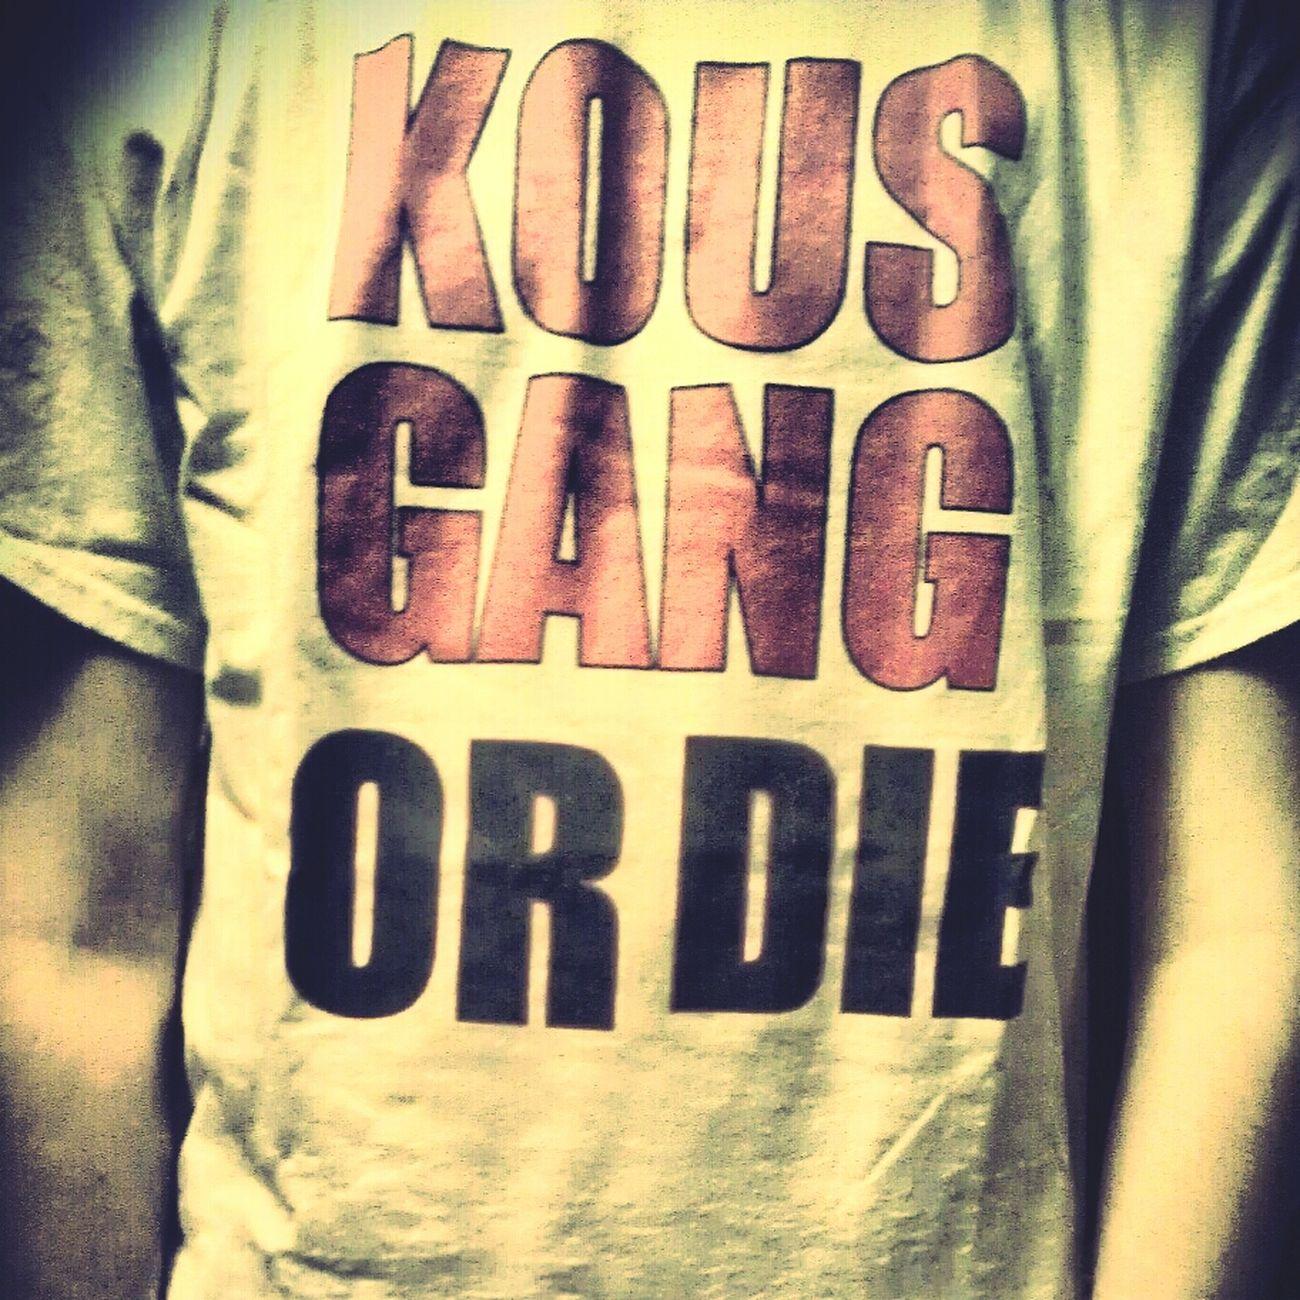 KGOD Bio Throwback 9th Grade  Bmhs  KGOD  Remember High School  Kous